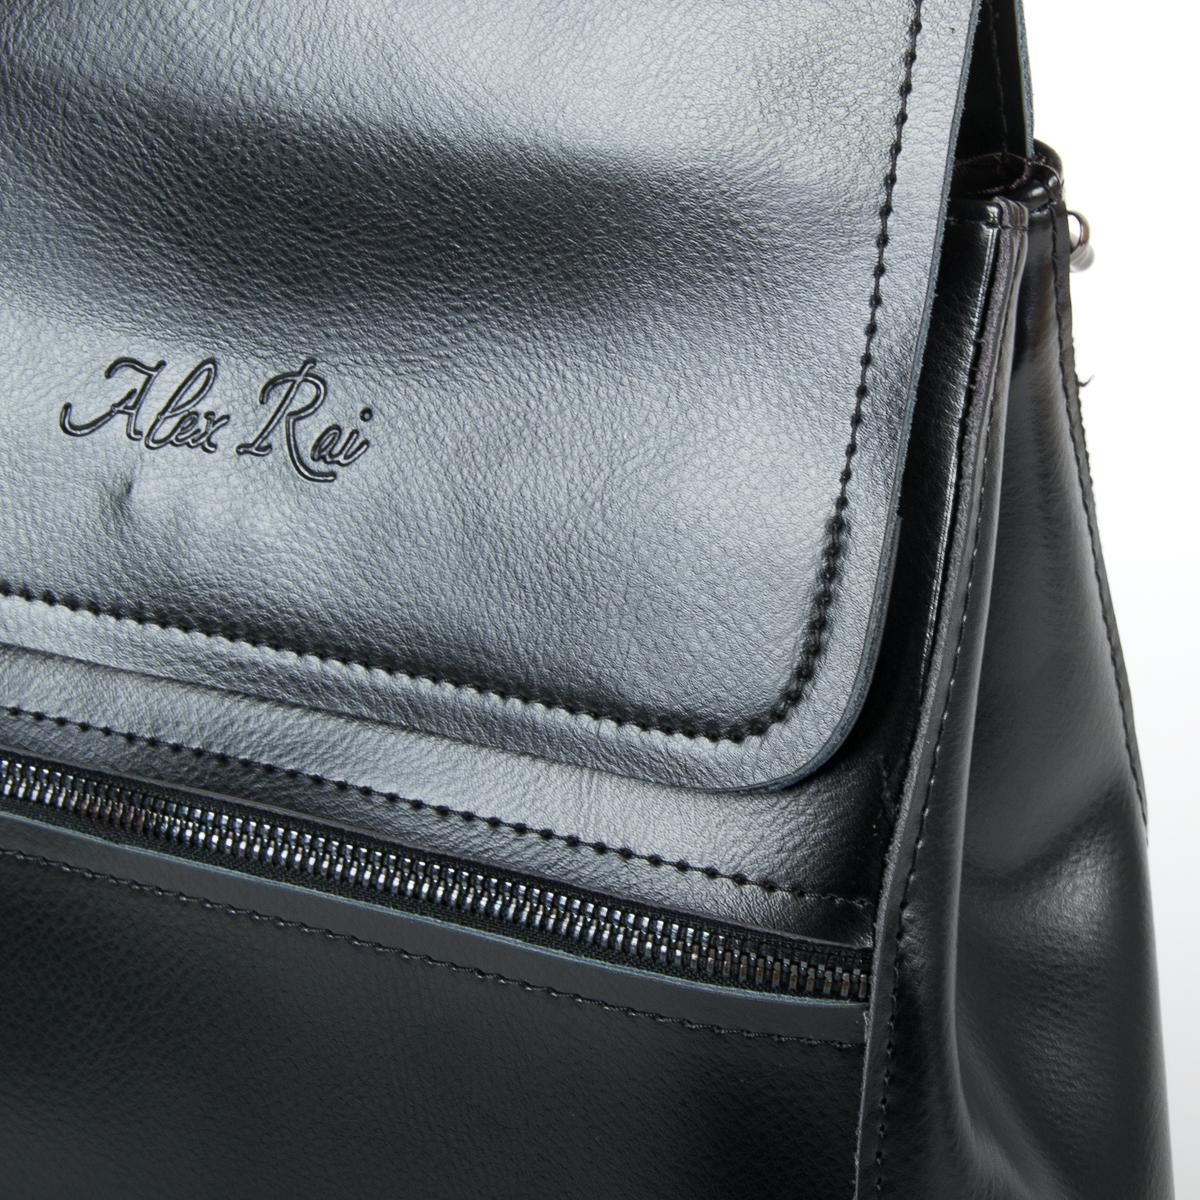 Сумка Женская Рюкзак кожа ALEX RAI 9-01 1005 black - фото 3